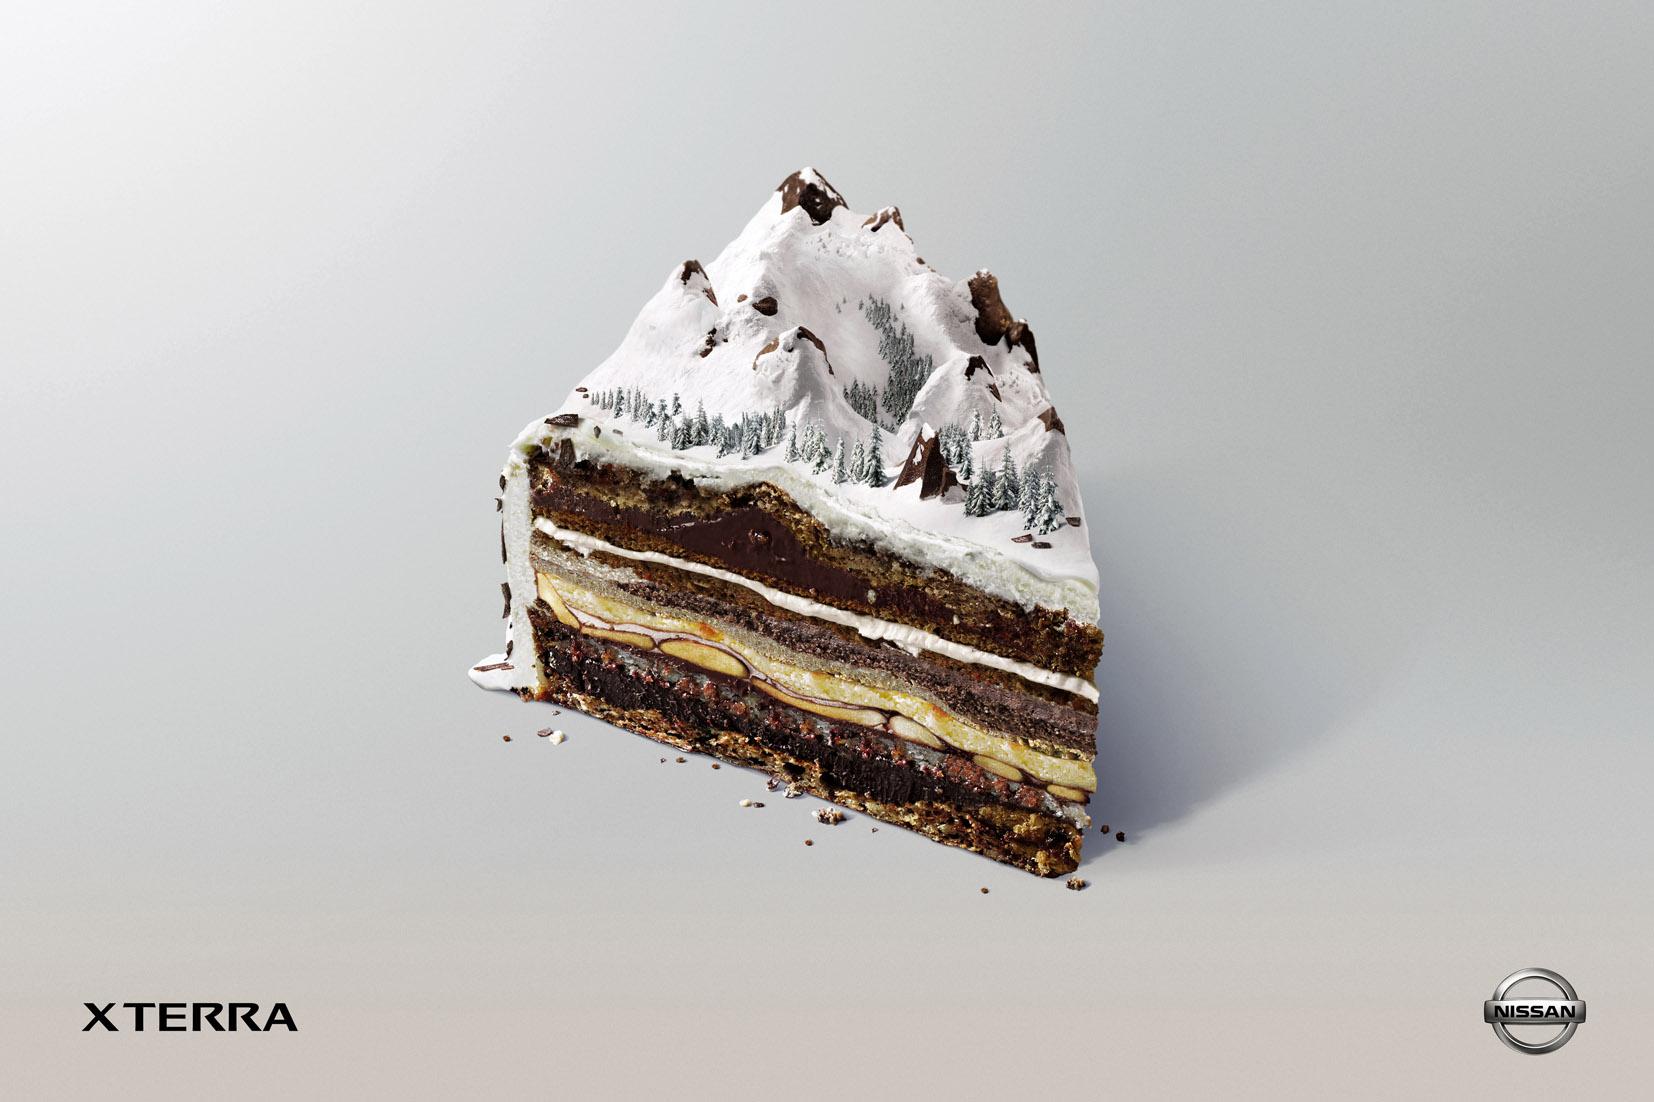 Nissan Xterra -  Piece of Cake